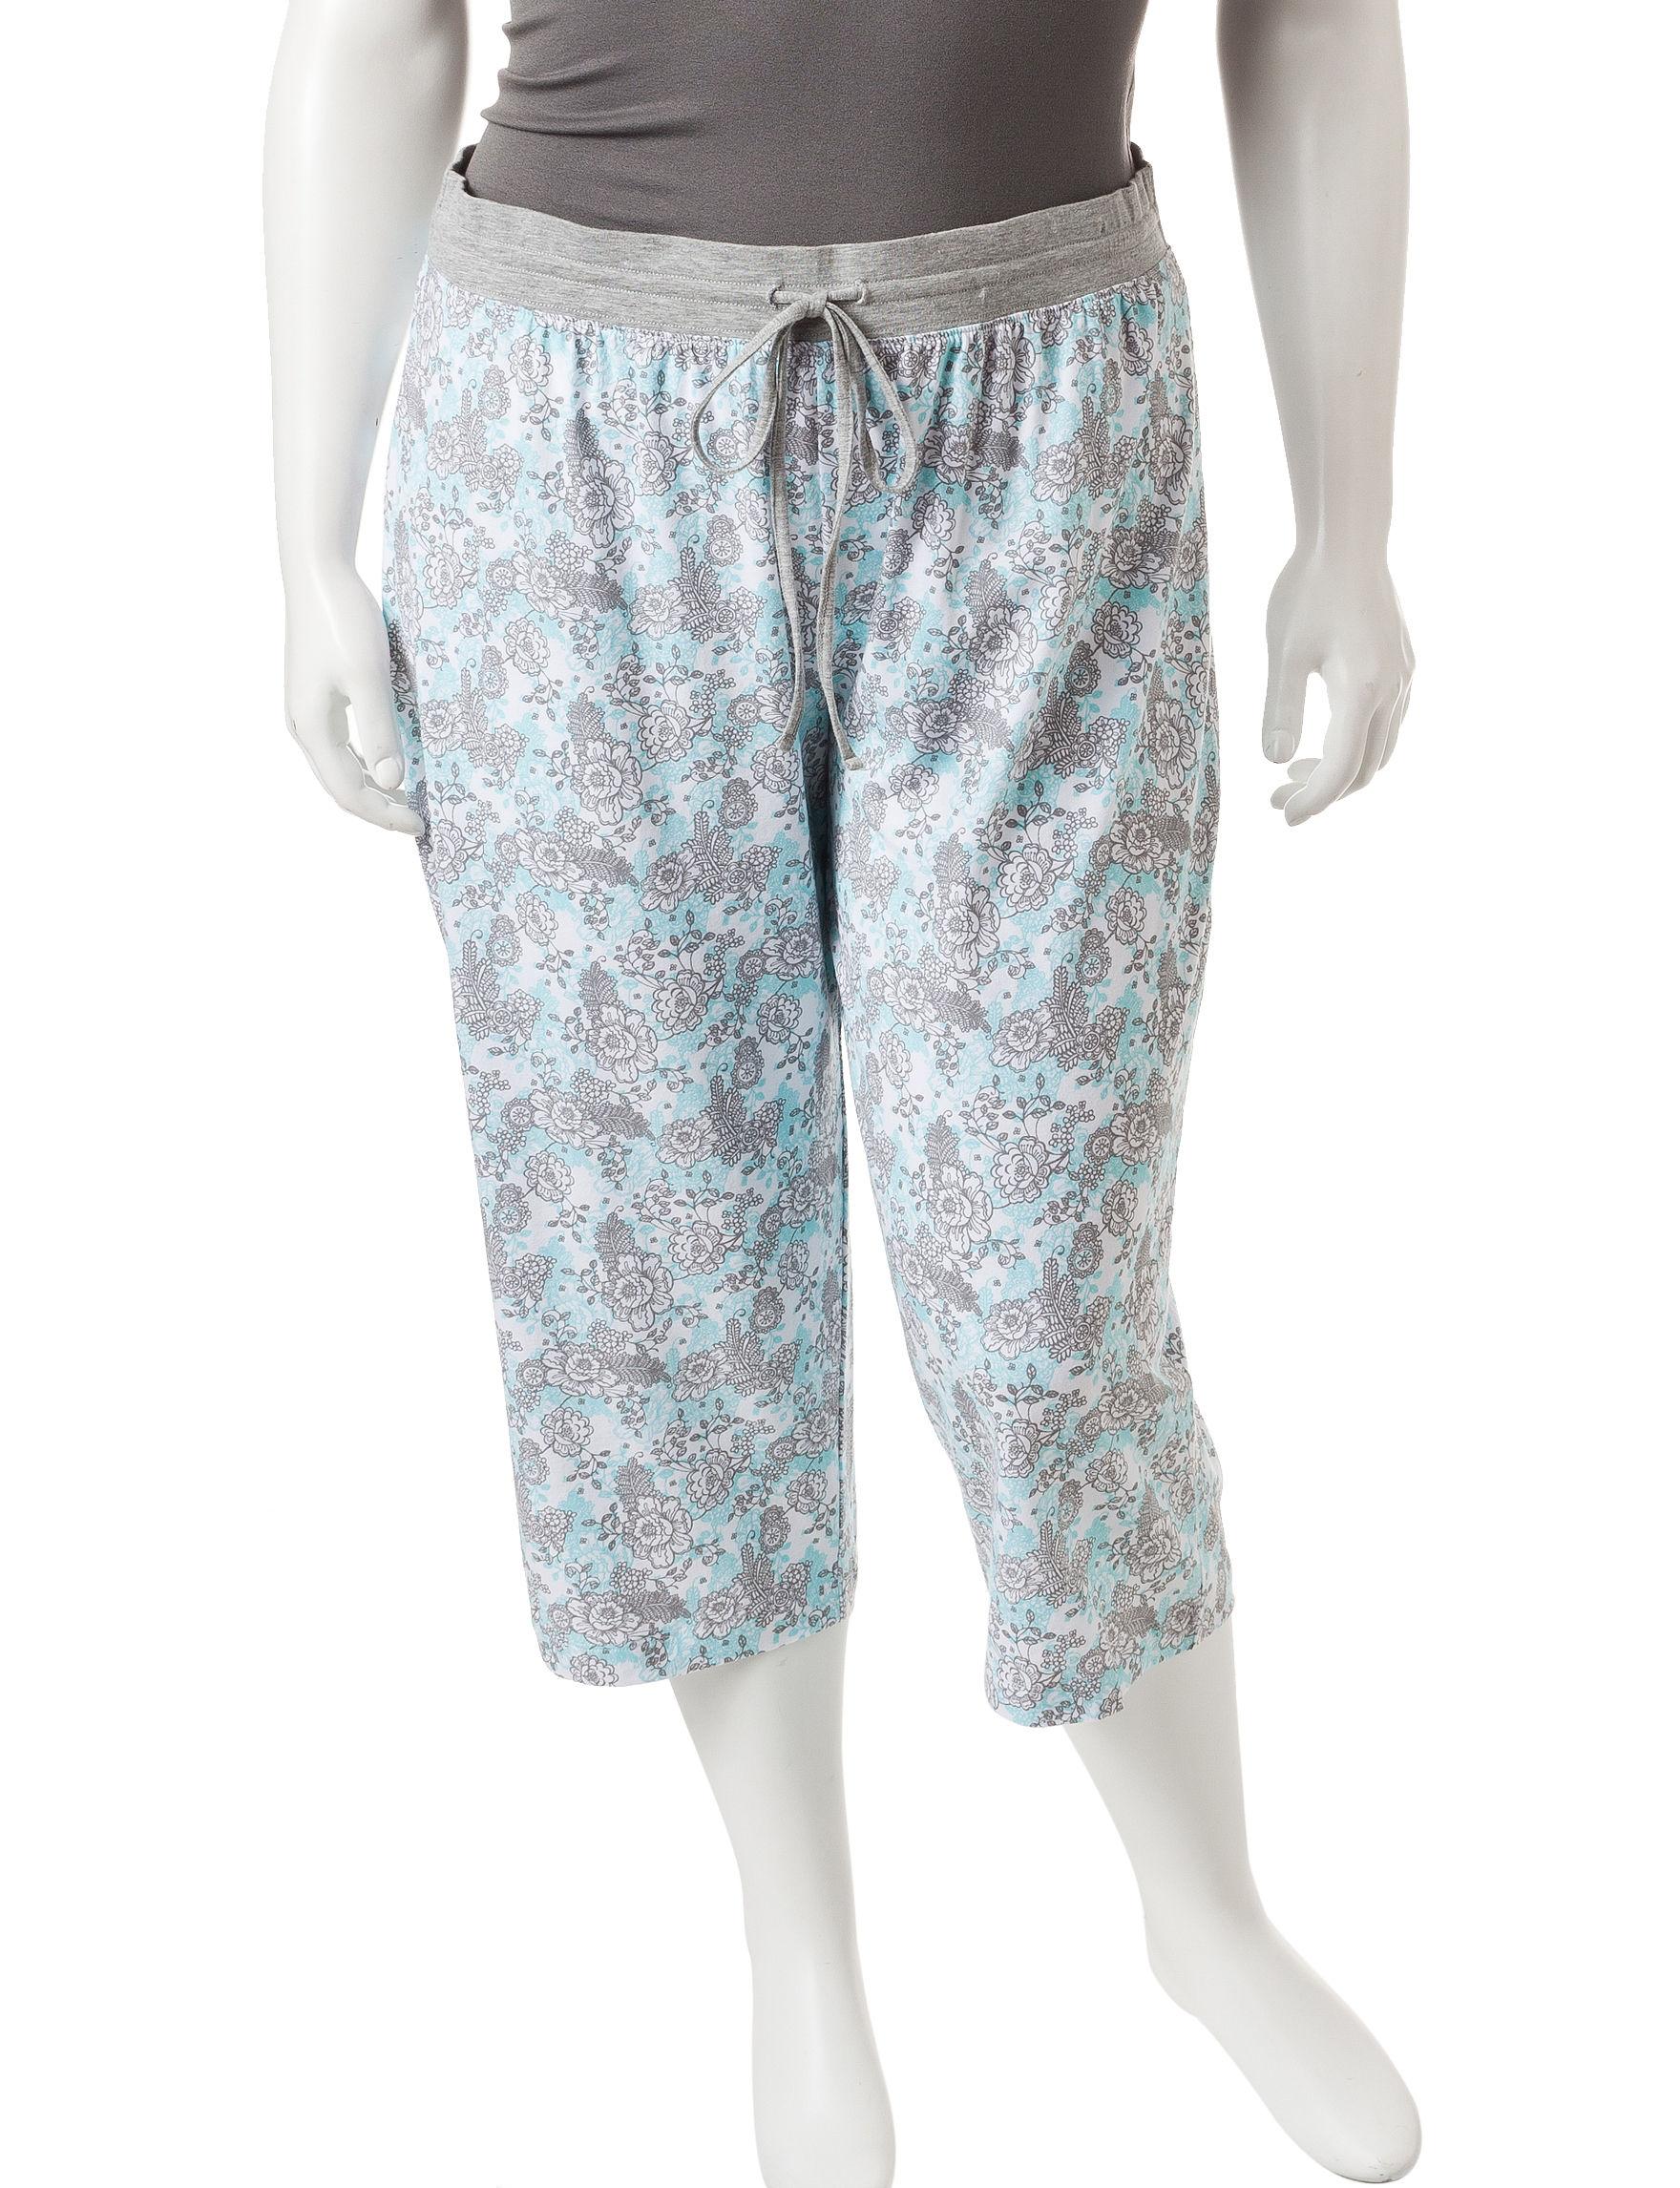 Rene Rofe Grey / Blue Pajama Bottoms